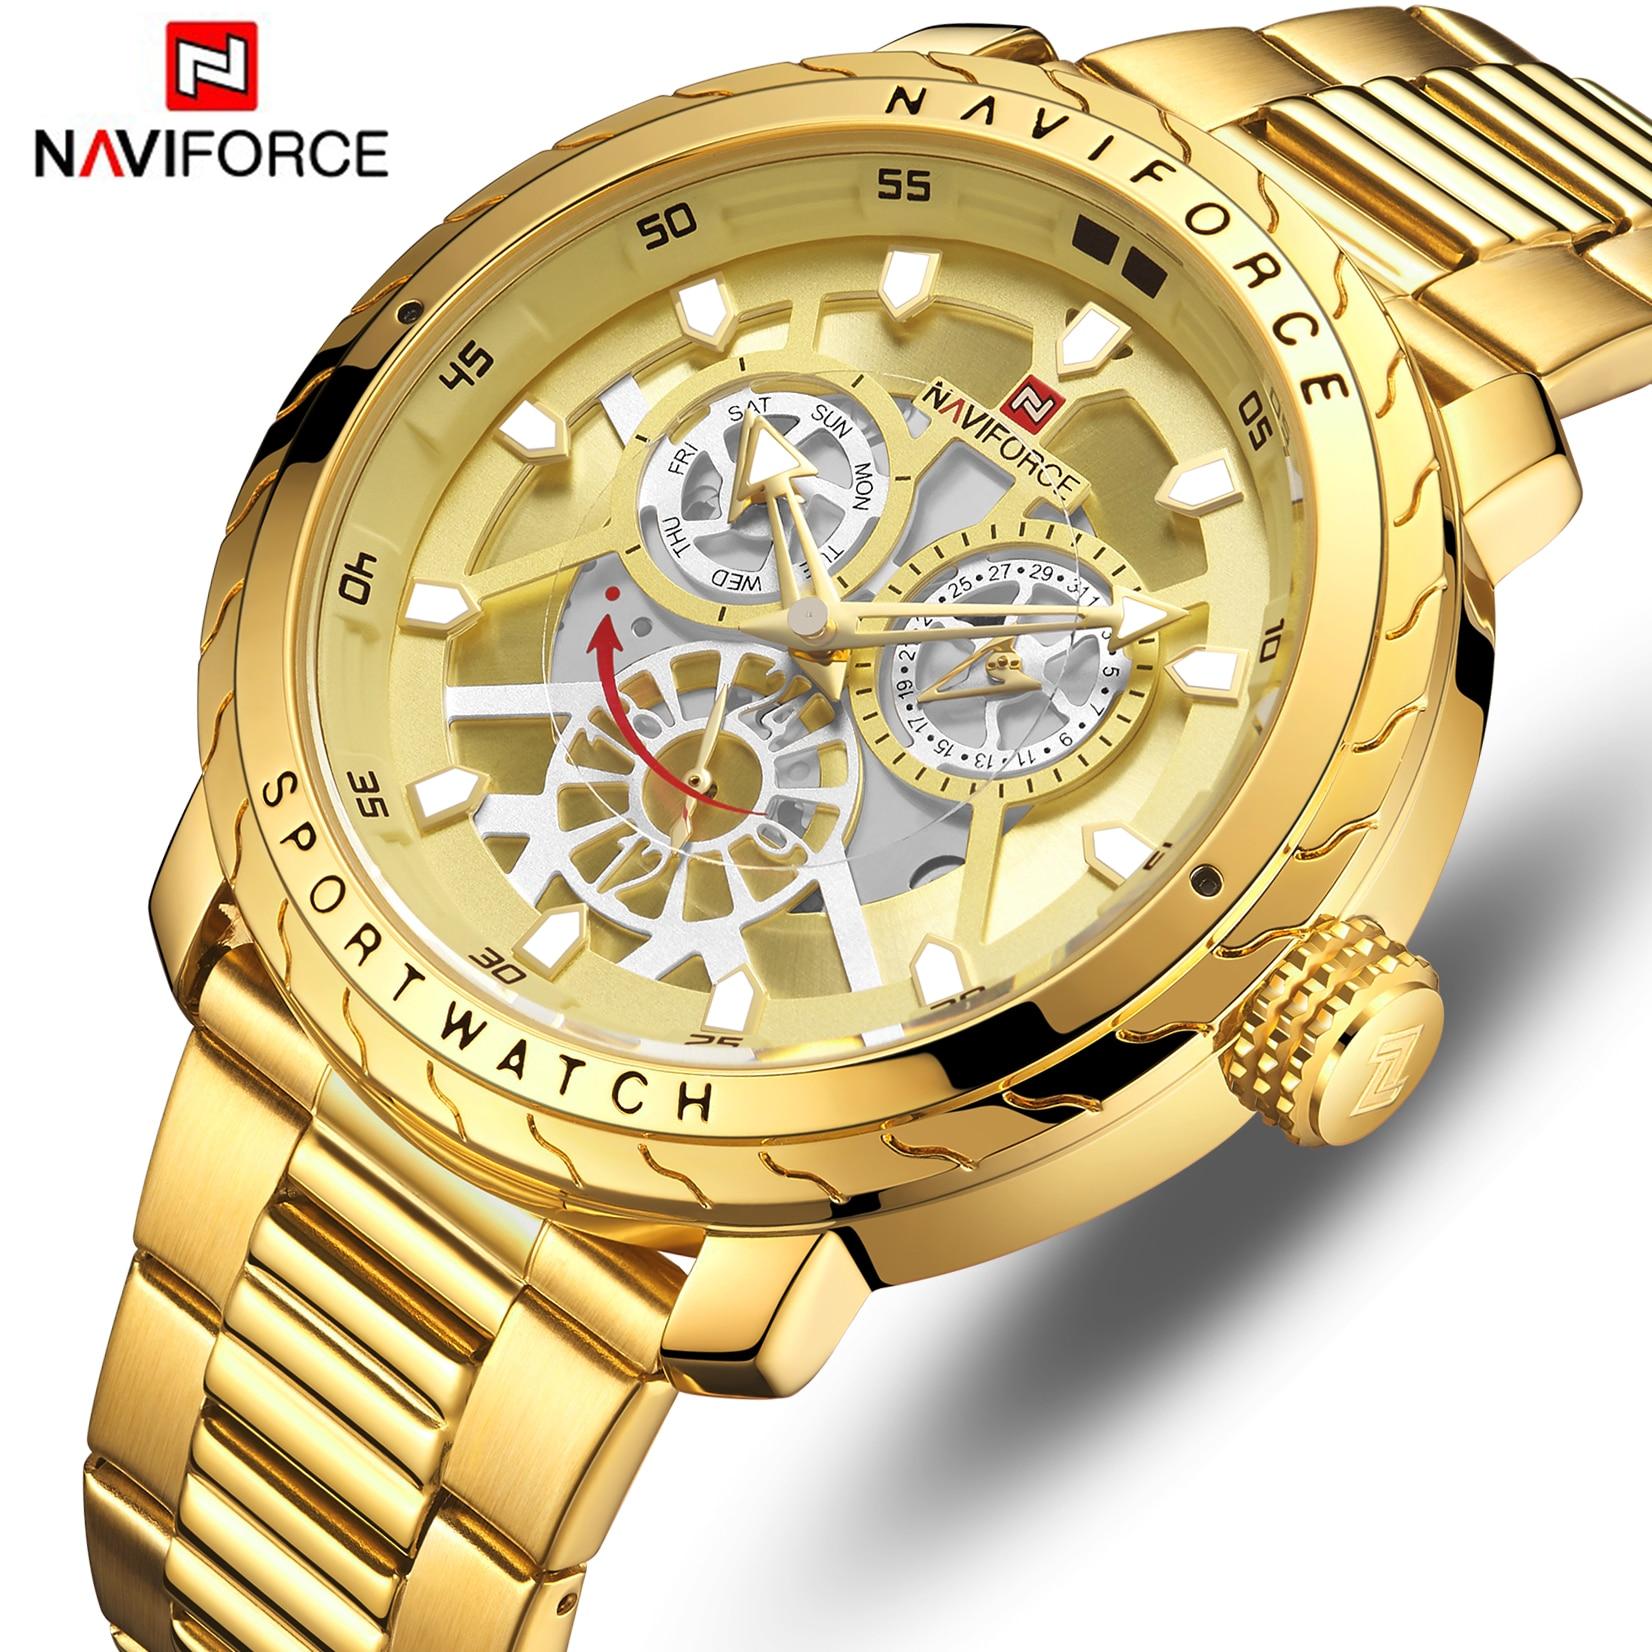 NAVIFORCE Watch Men Fashion Gold Quartz Wristwatch Stainless Steel Waterproof Sport Men's Watches Date 24 Hour Analog Male Clock|Quartz Watches| |  - title=